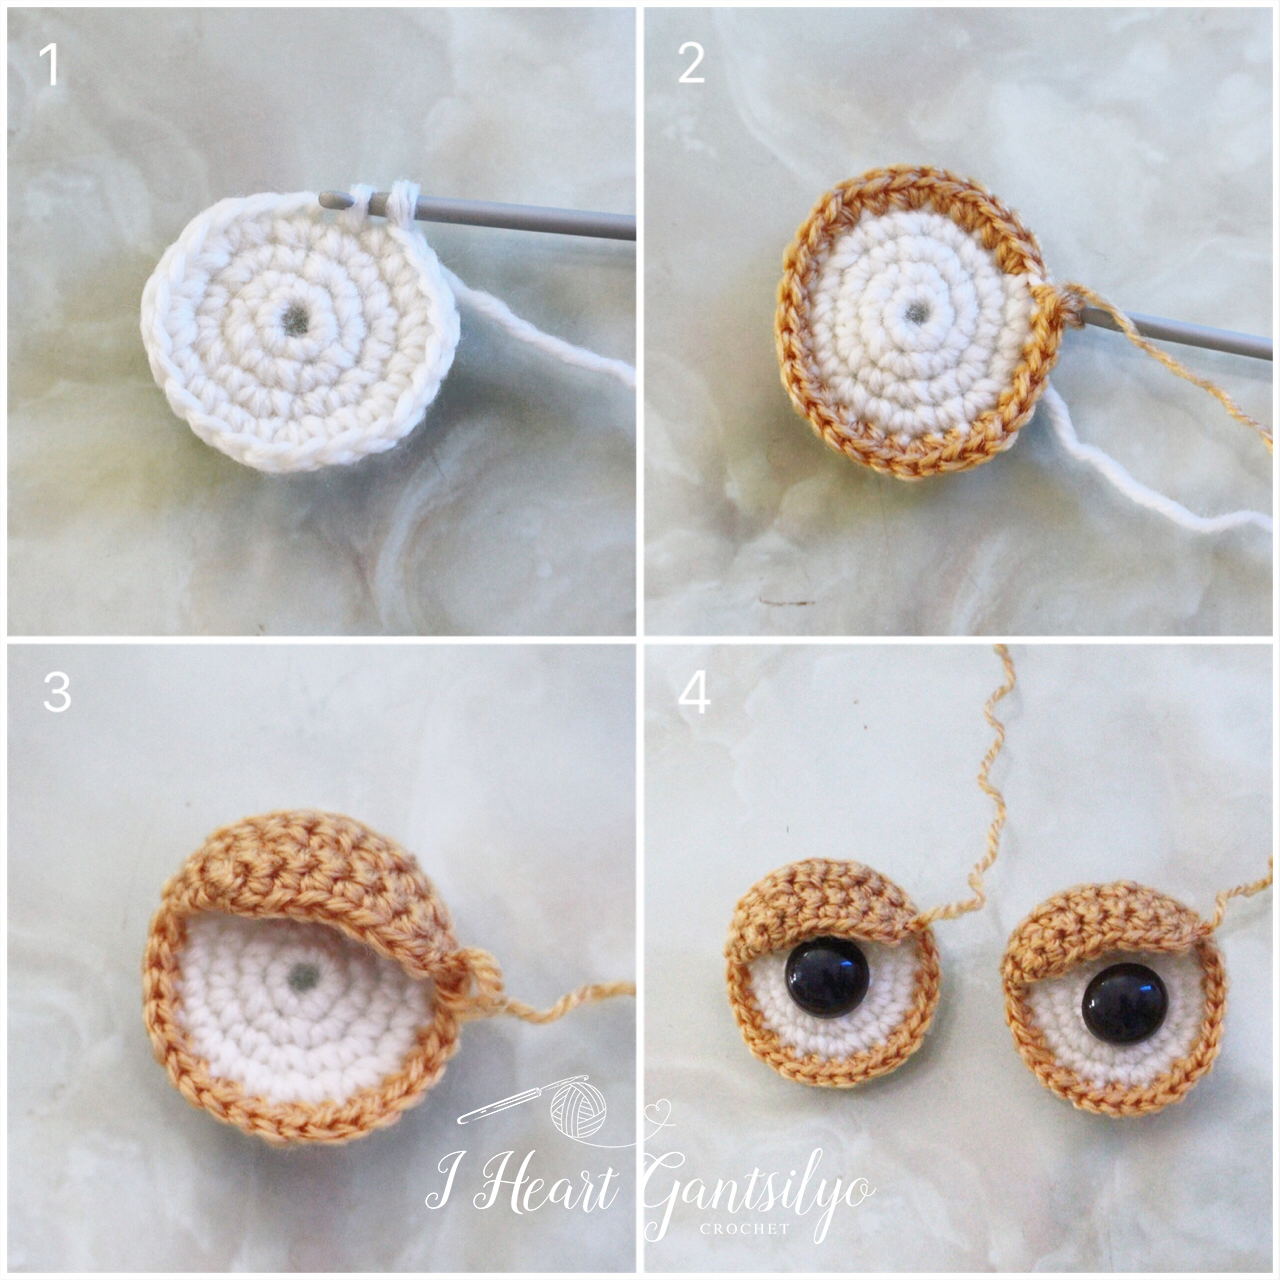 Crochet Buddy Turtle | I Heart Gantsilyo